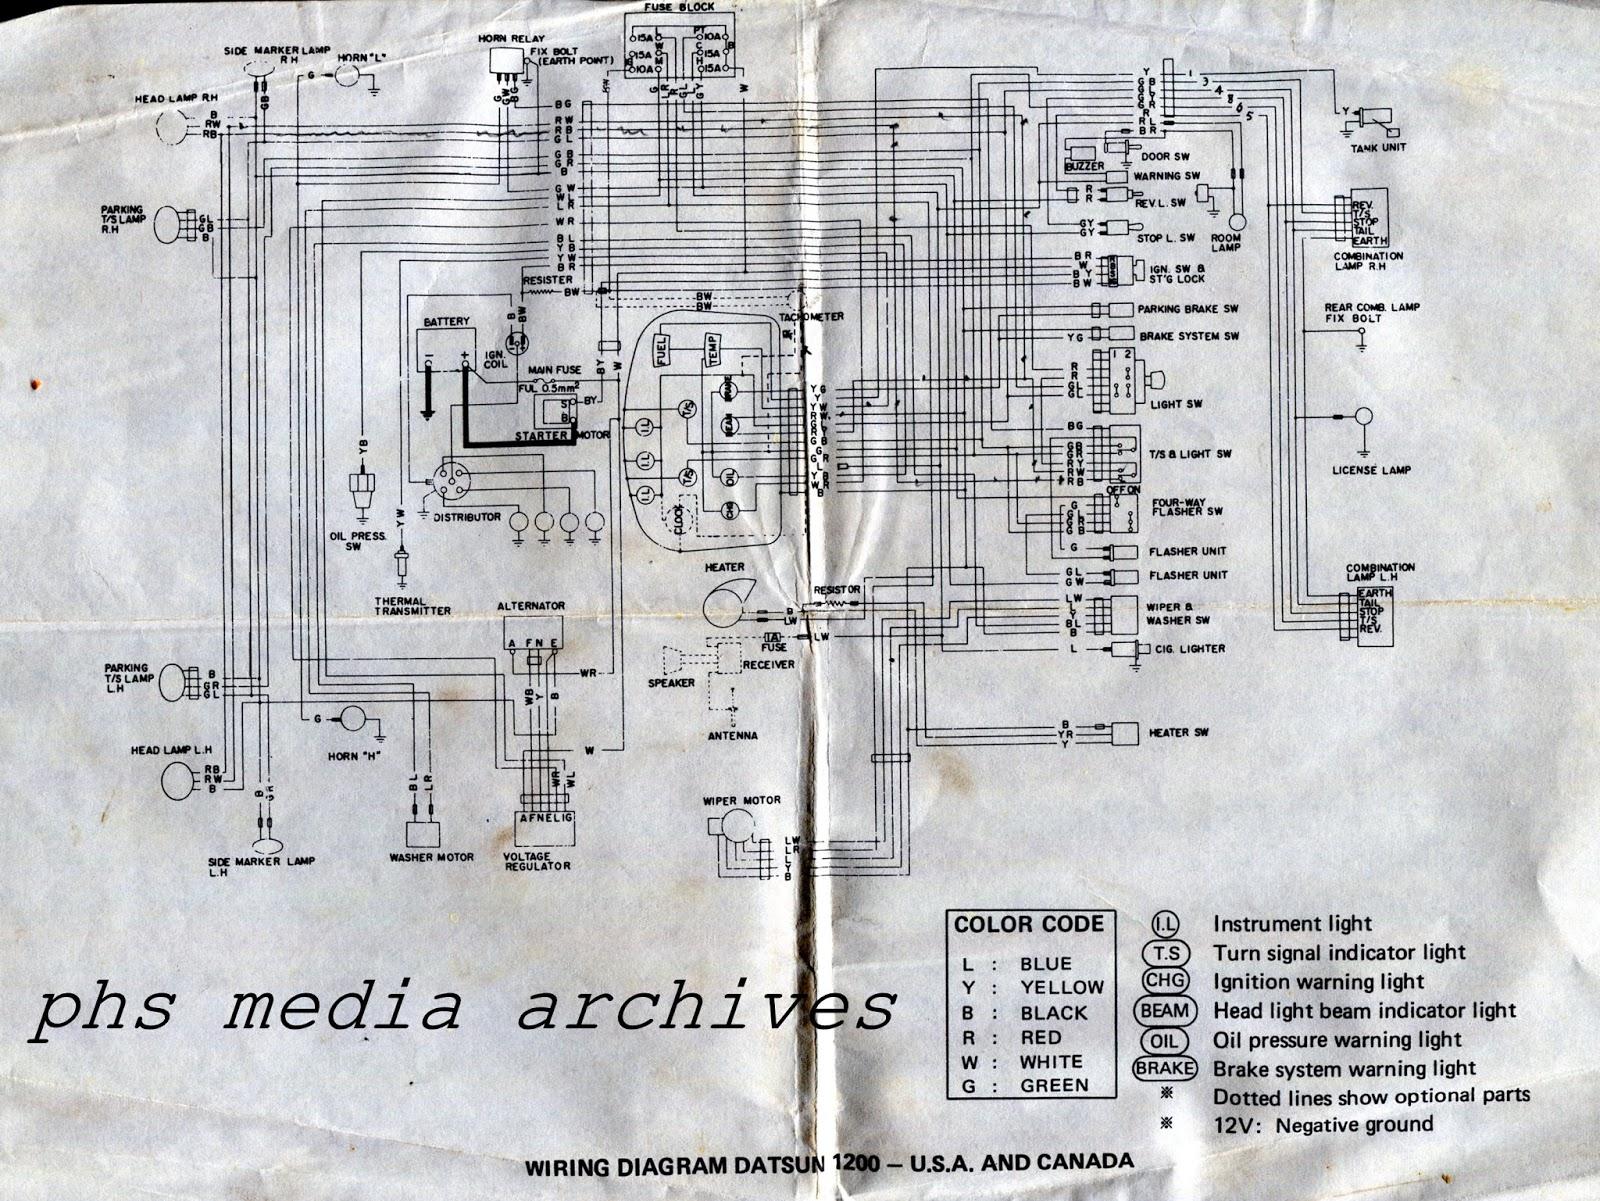 Datsun 1200 Wiring Diagram on